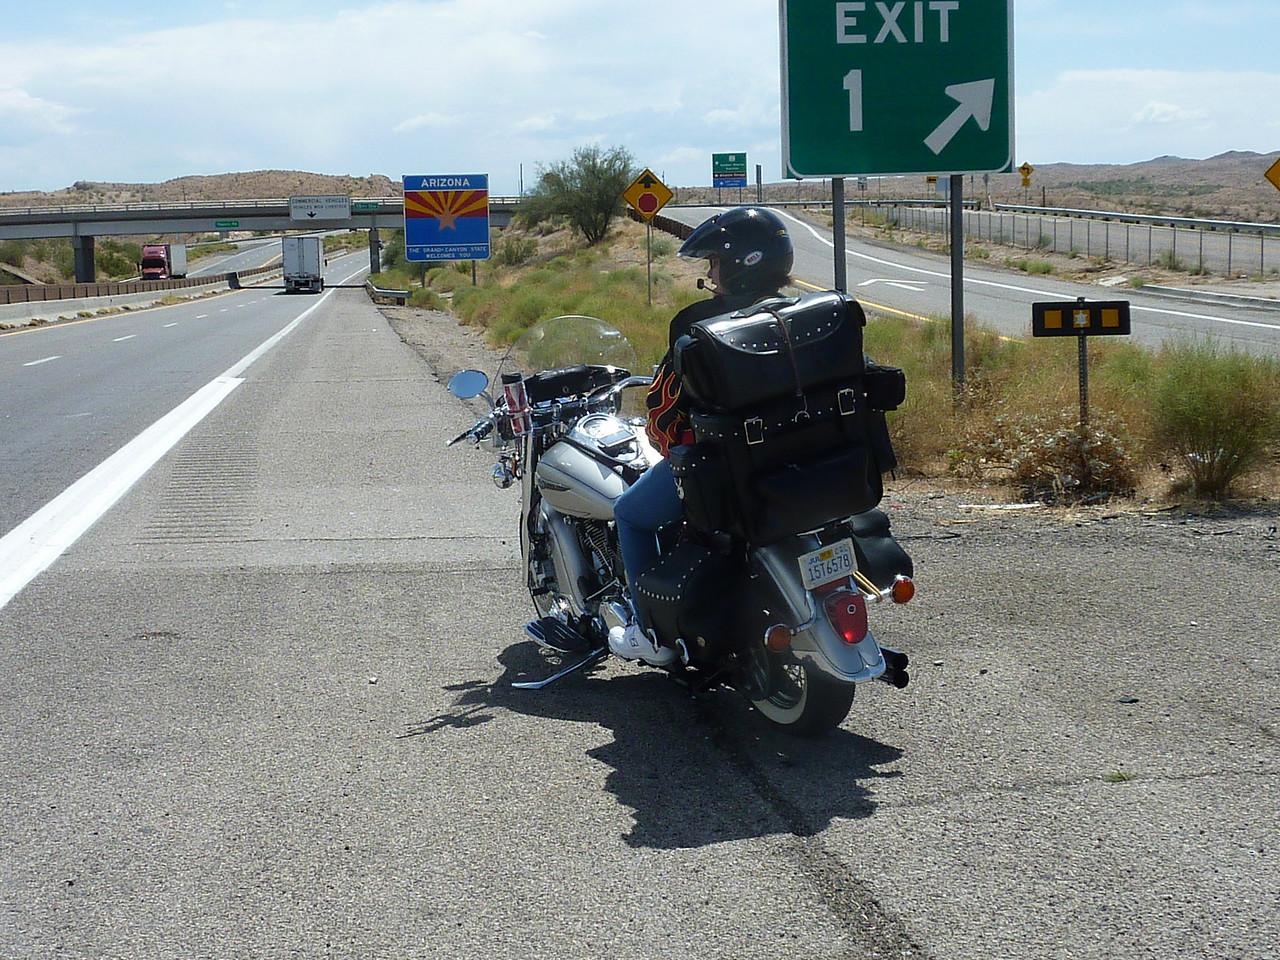 Entering Arizona